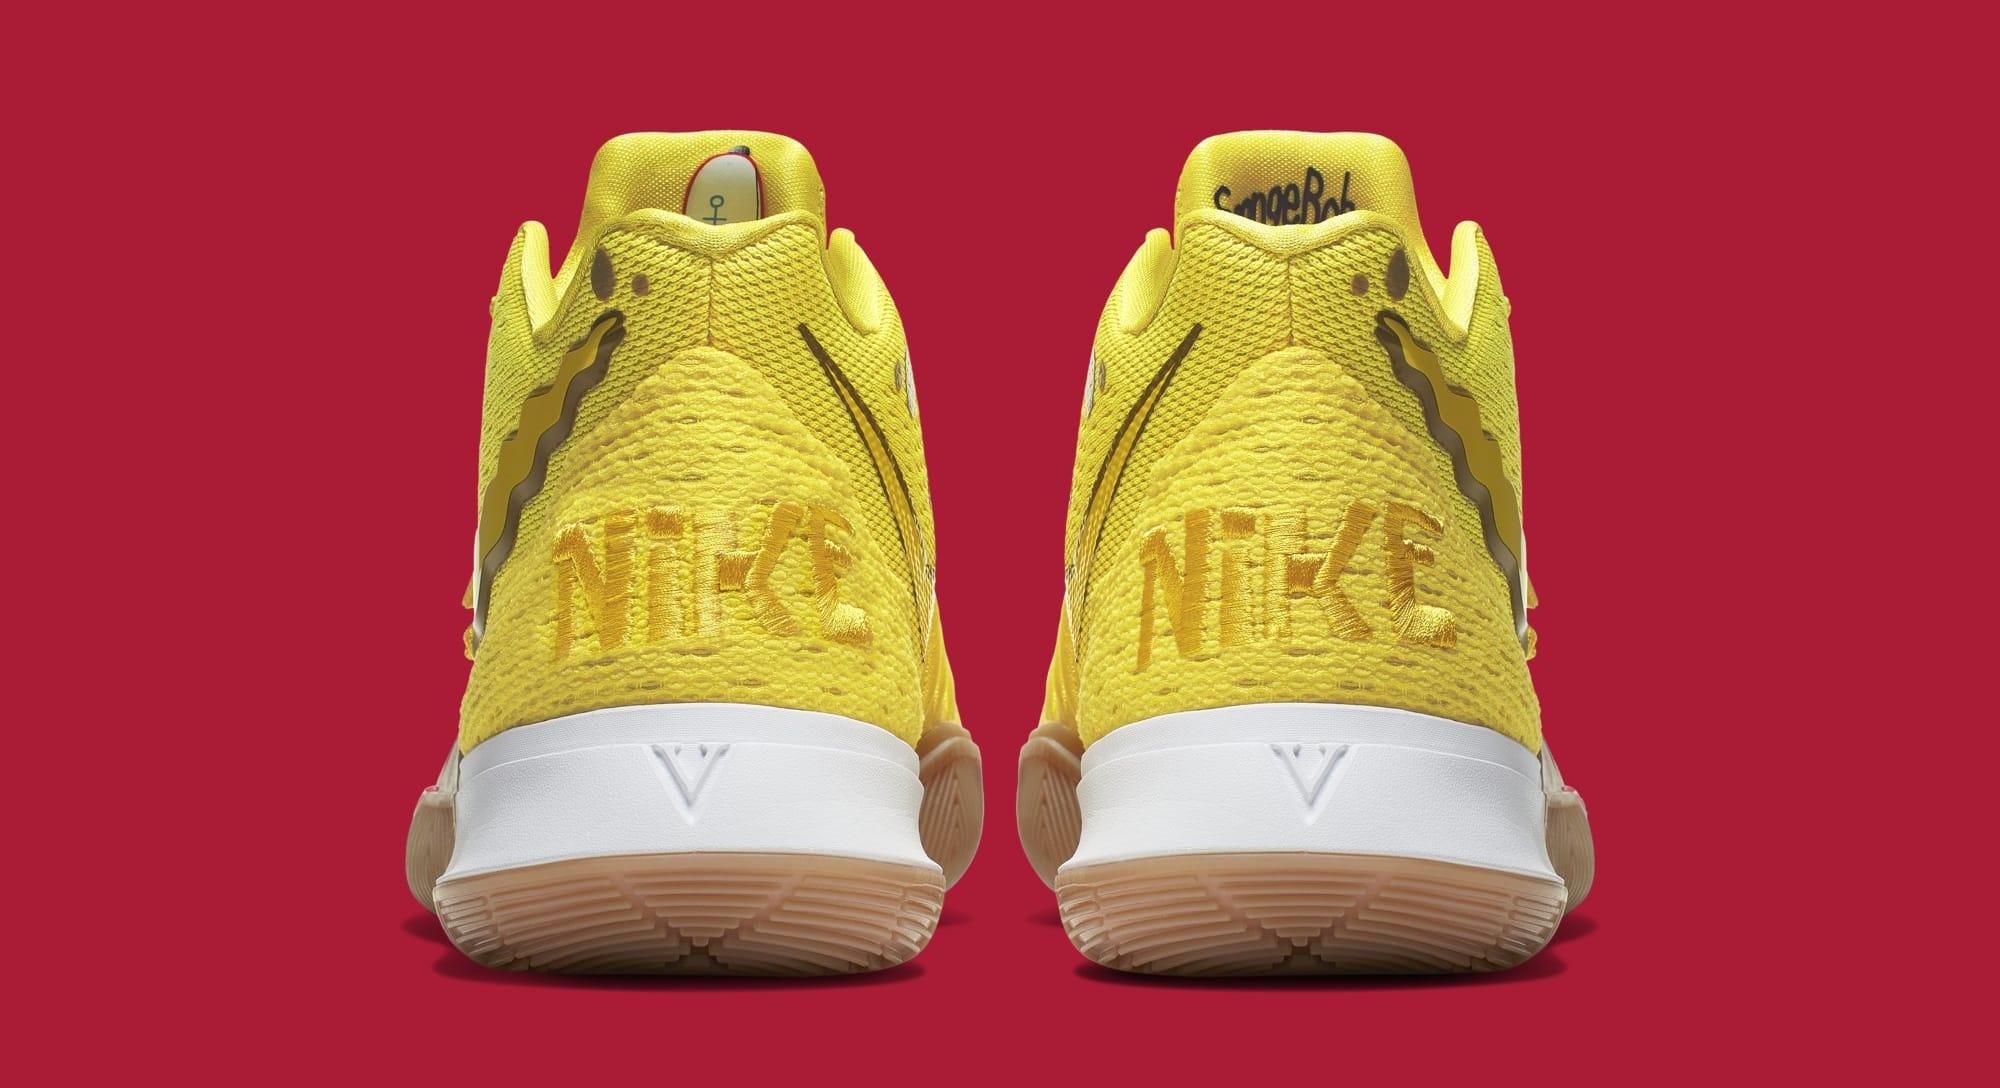 'SpongeBob SquarePants' x Nike Kyrie 5 'SpongeBob' CJ6951-700 (Heel)